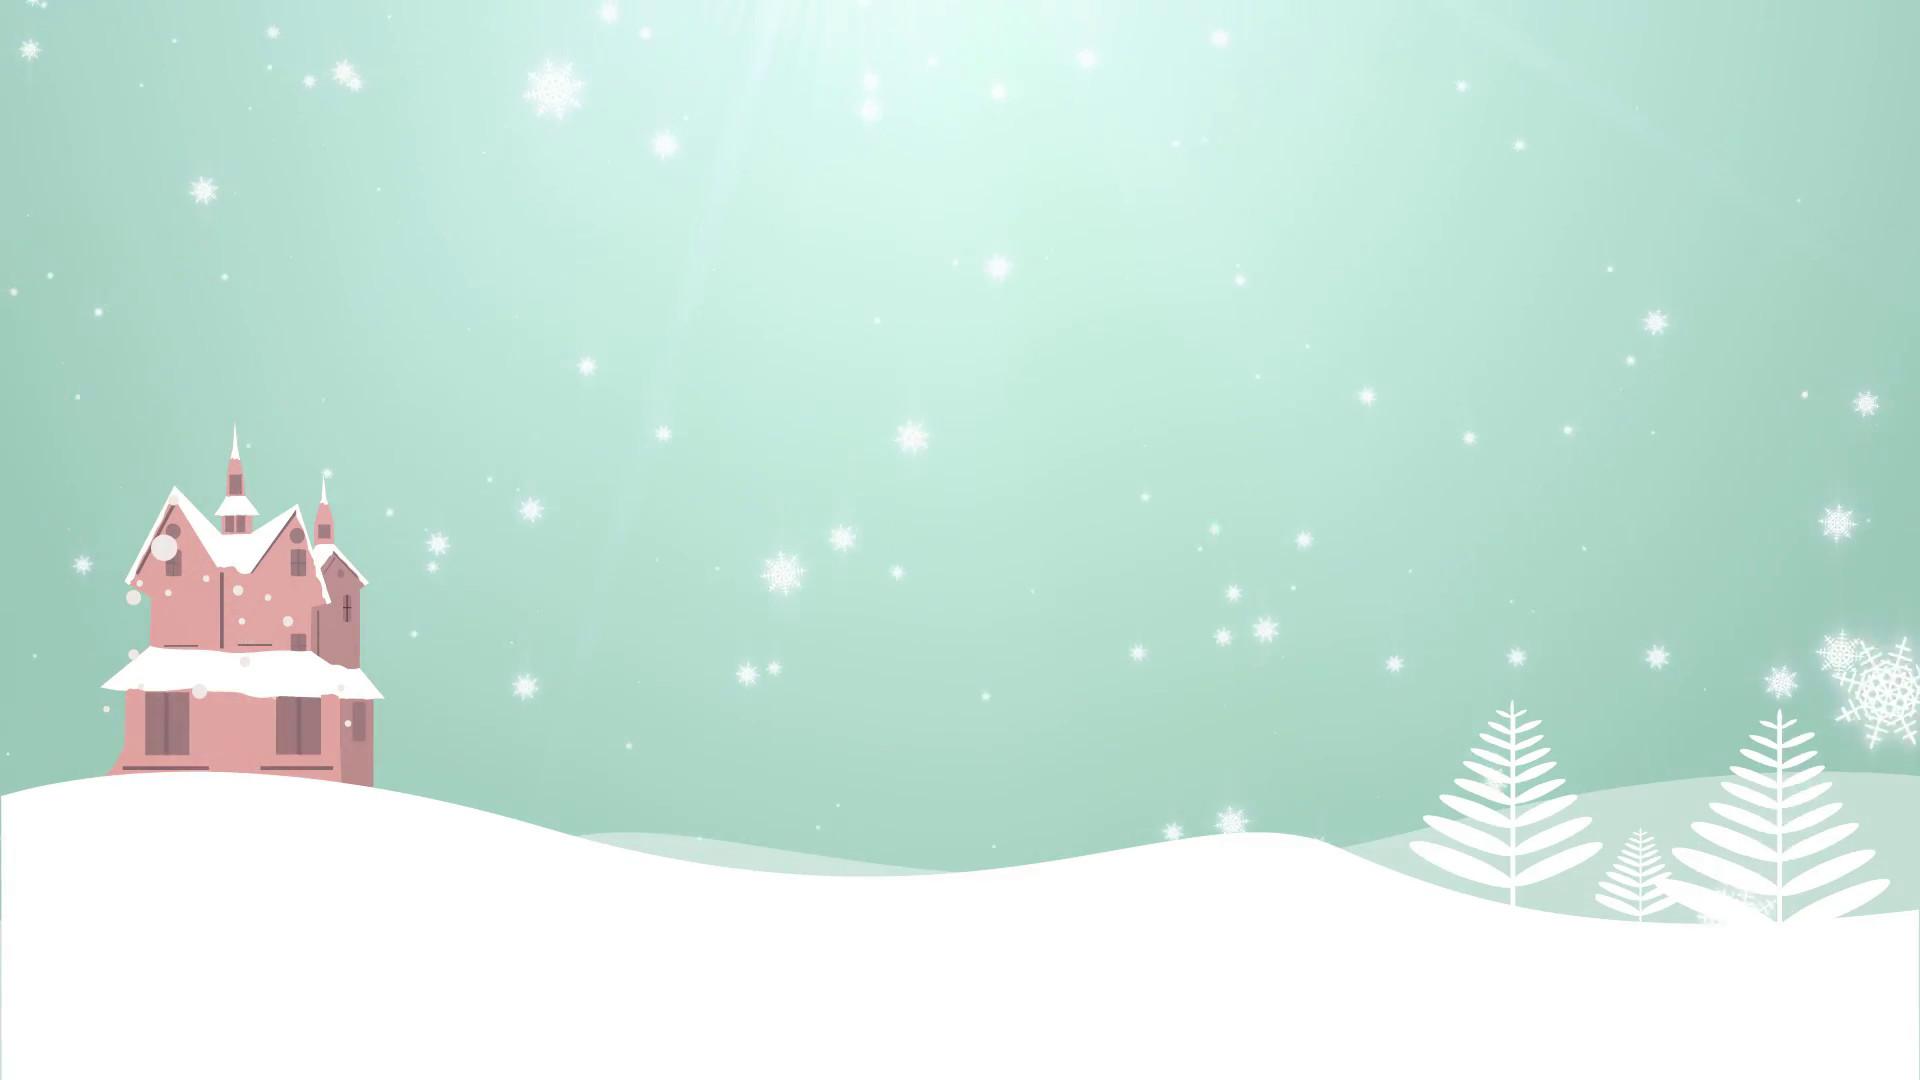 Winter Wonderland Iphone Wallpaper Winter Wonderland Backgrounds 41 Images